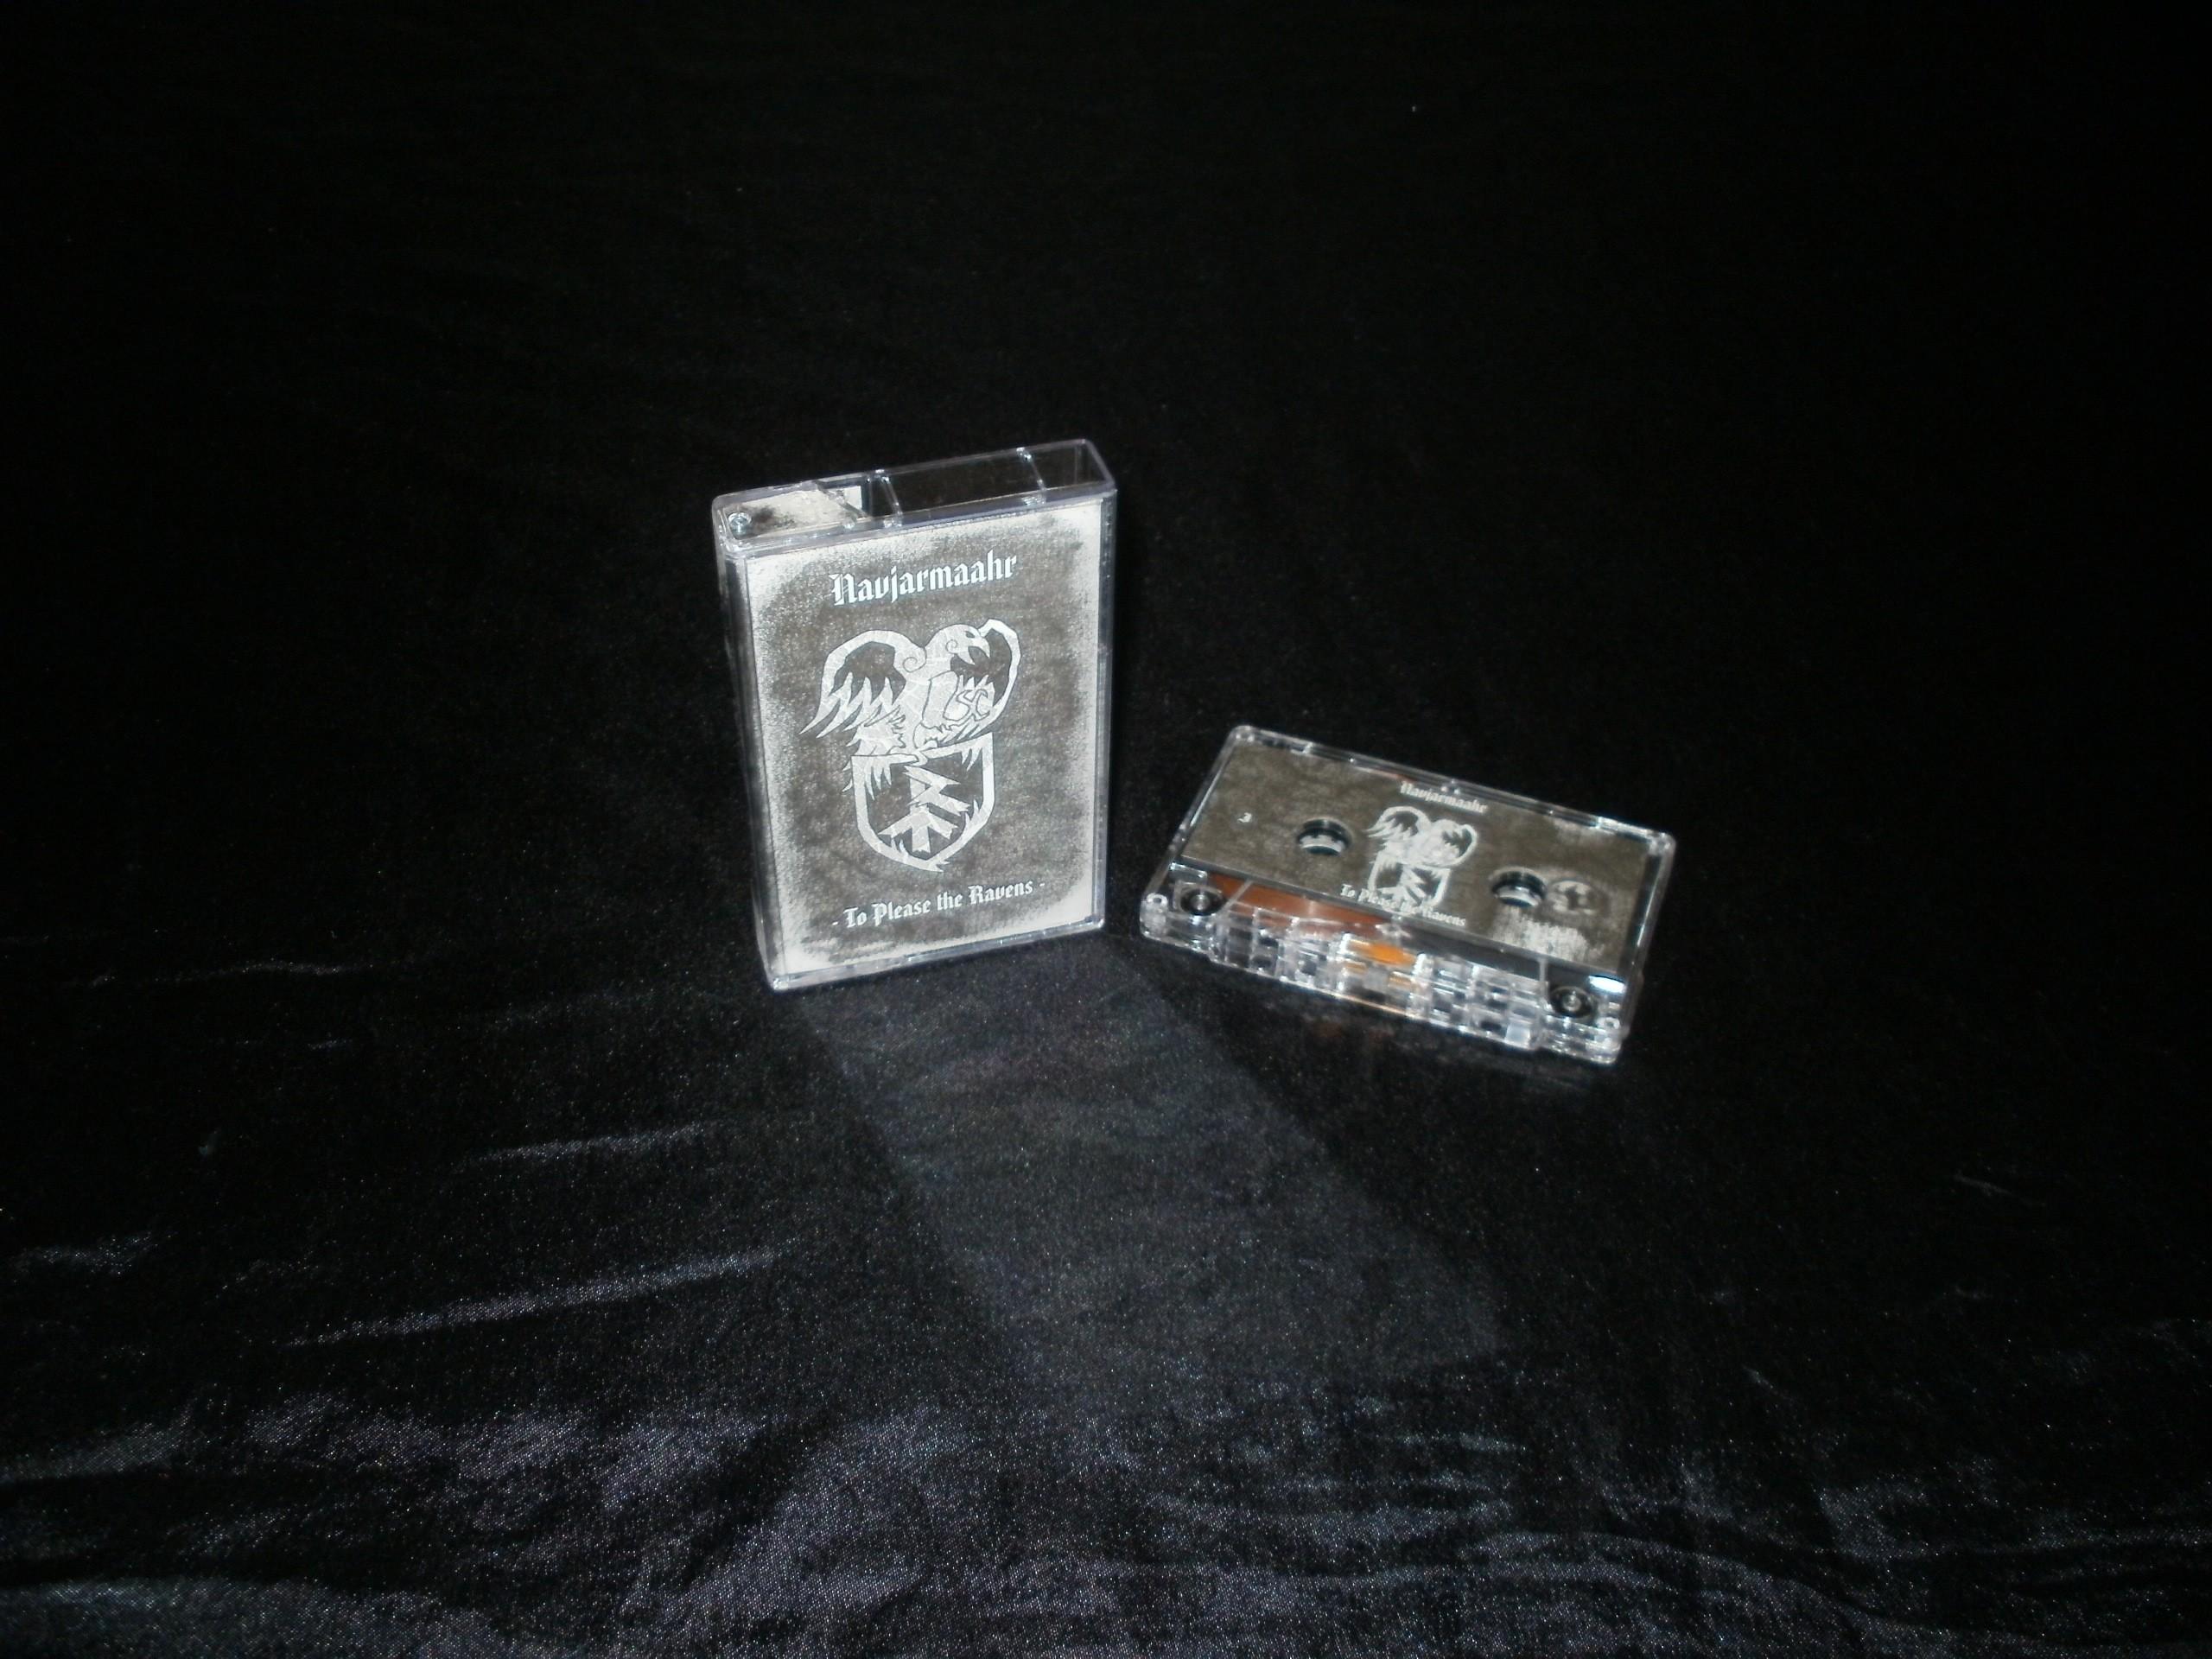 NAVJARMAAHR - TO PLEASE THE RAVENS Tape